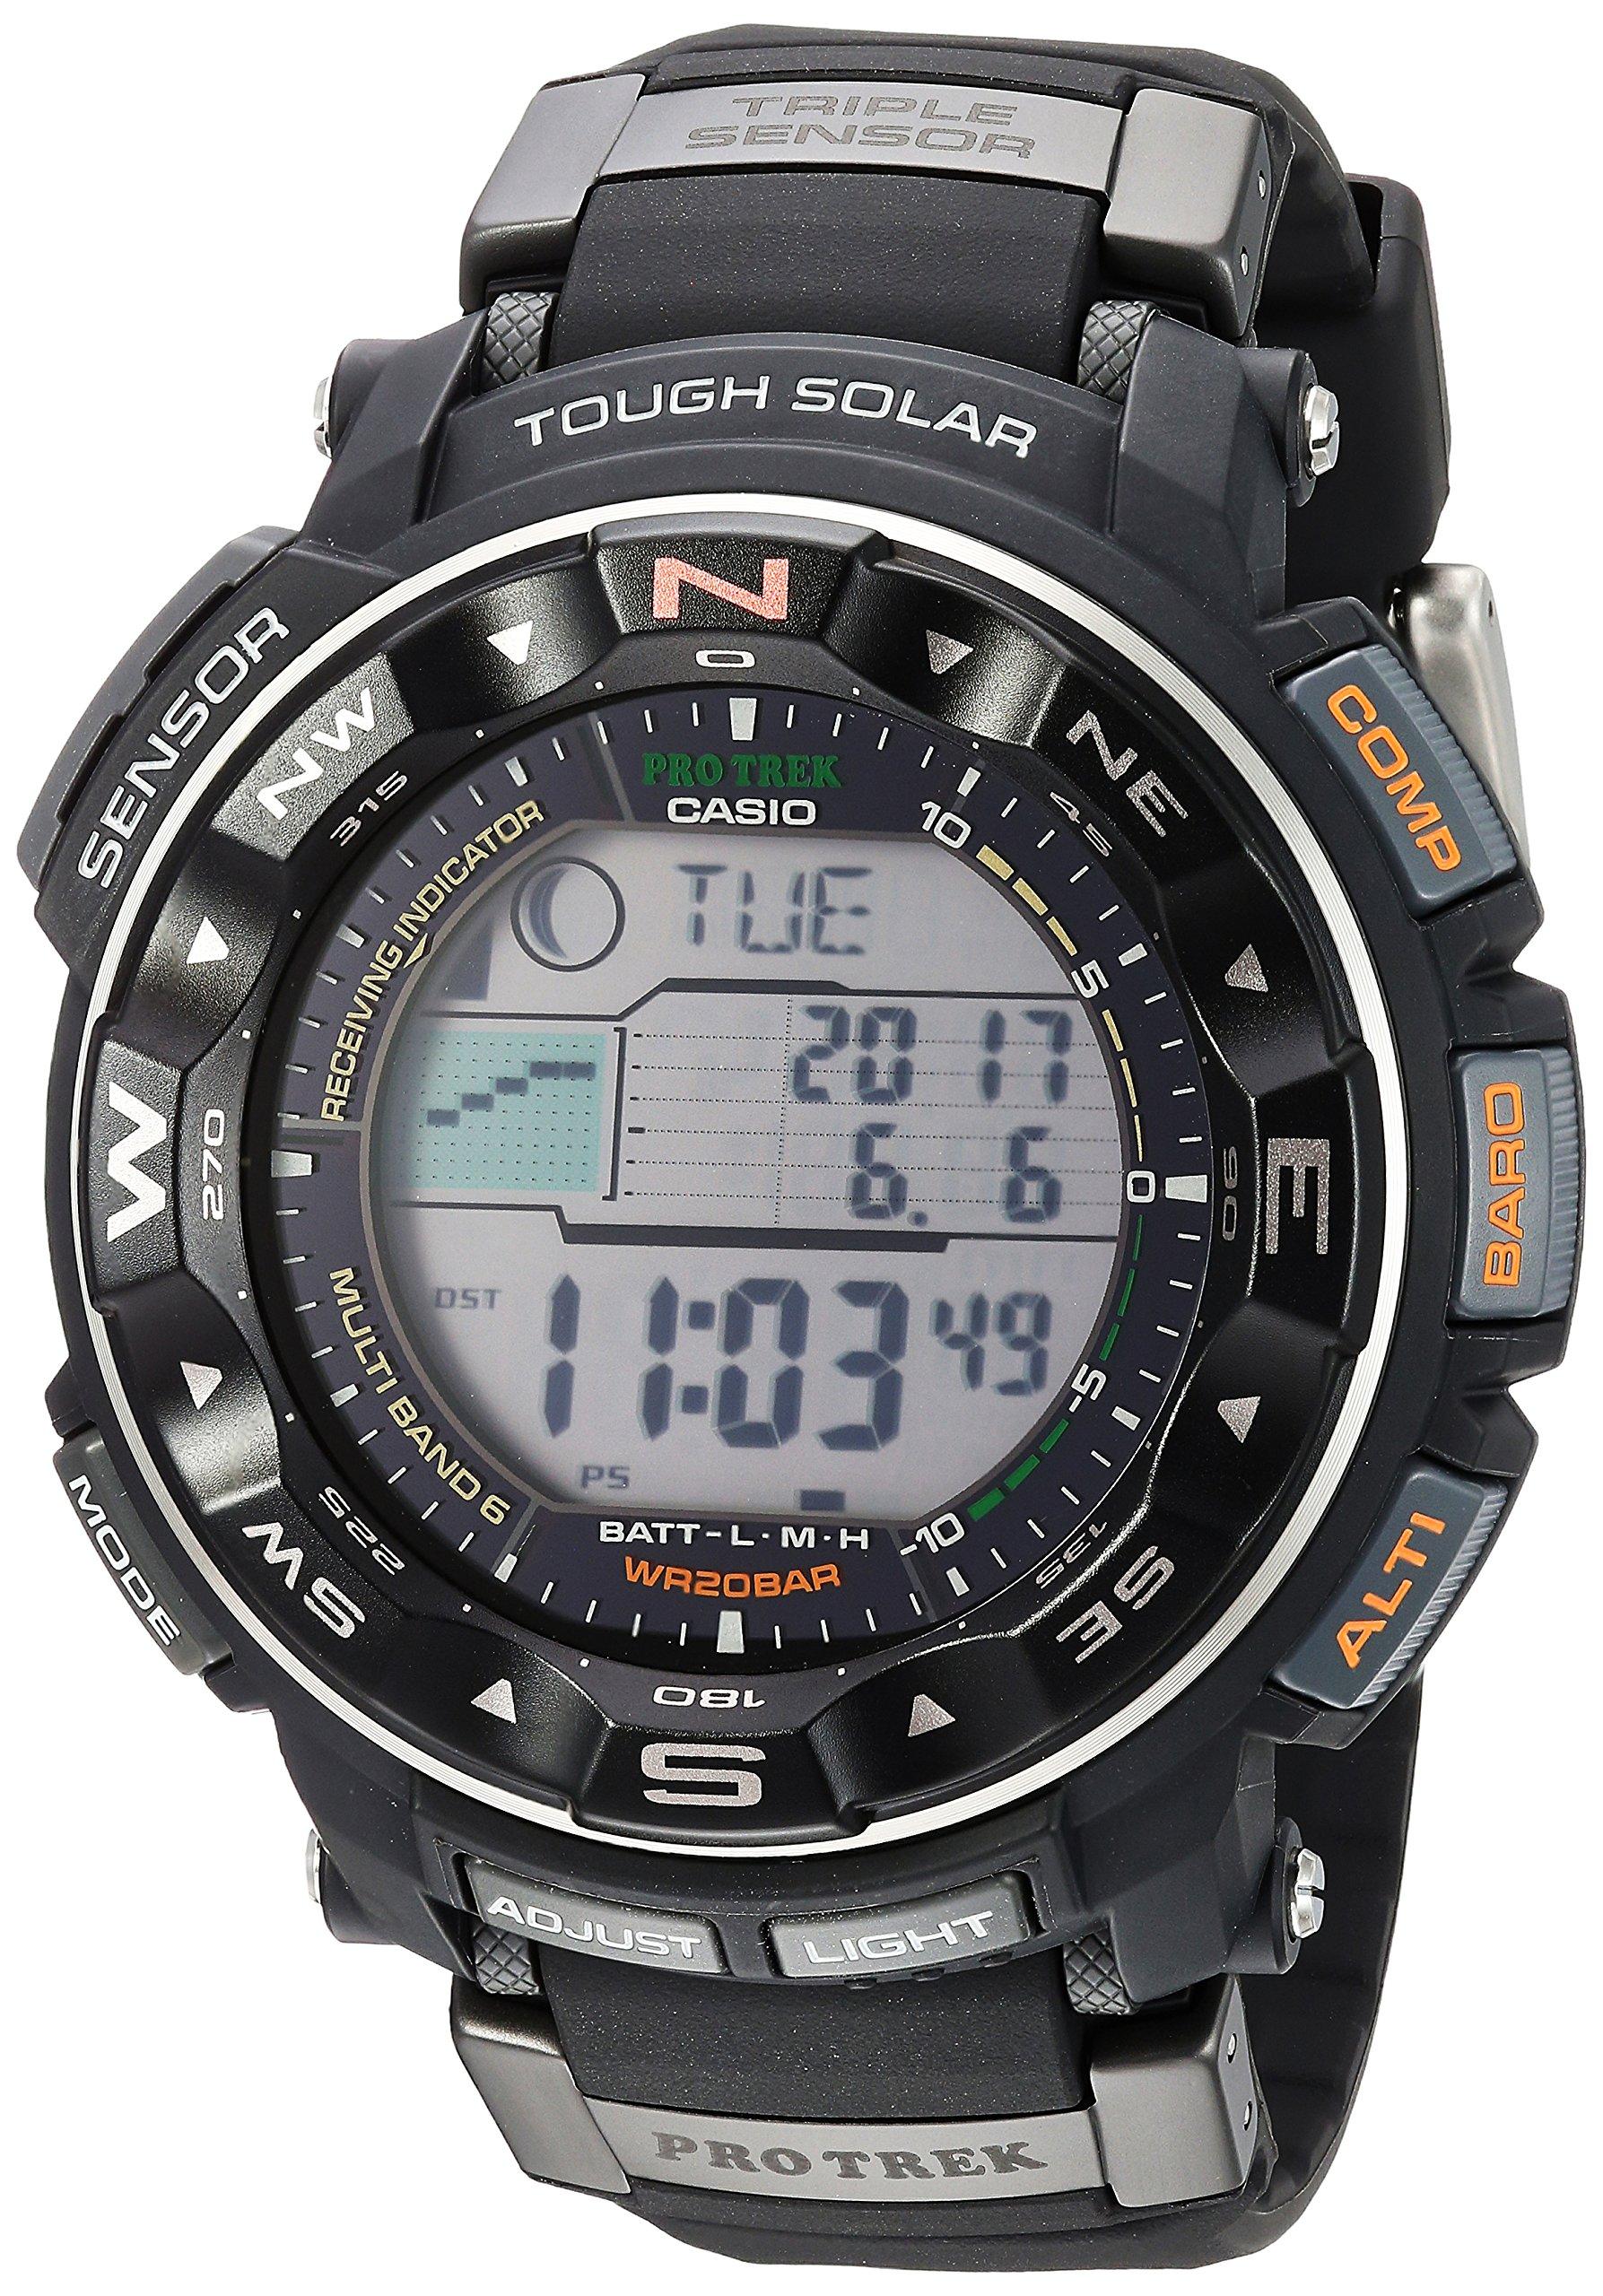 Casio Men's PRW-2500R-1CR Pro Trek Tough Solar Digital Sport Watch